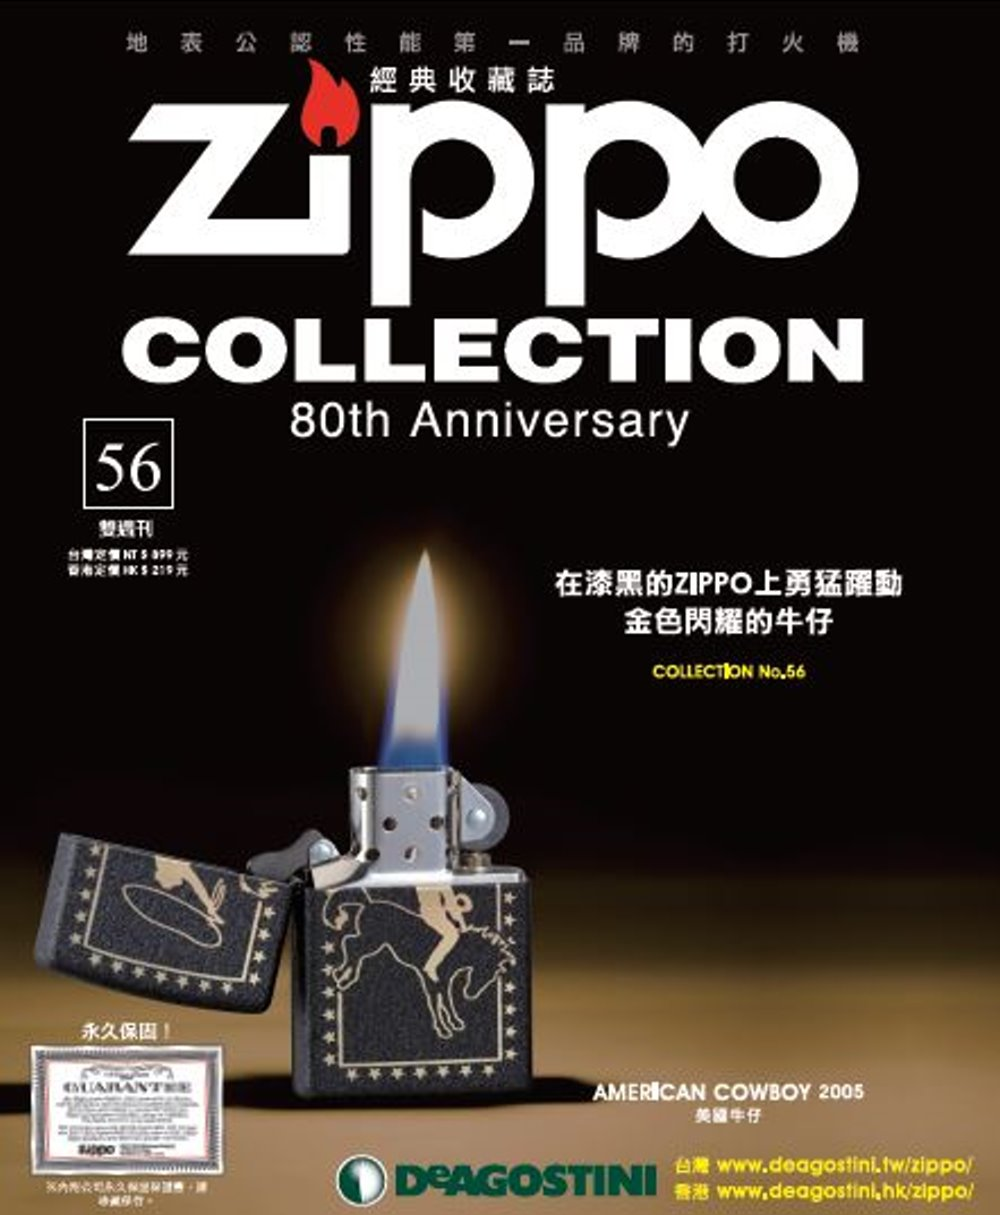 Zippo經典收藏誌 2017/11/20第56期